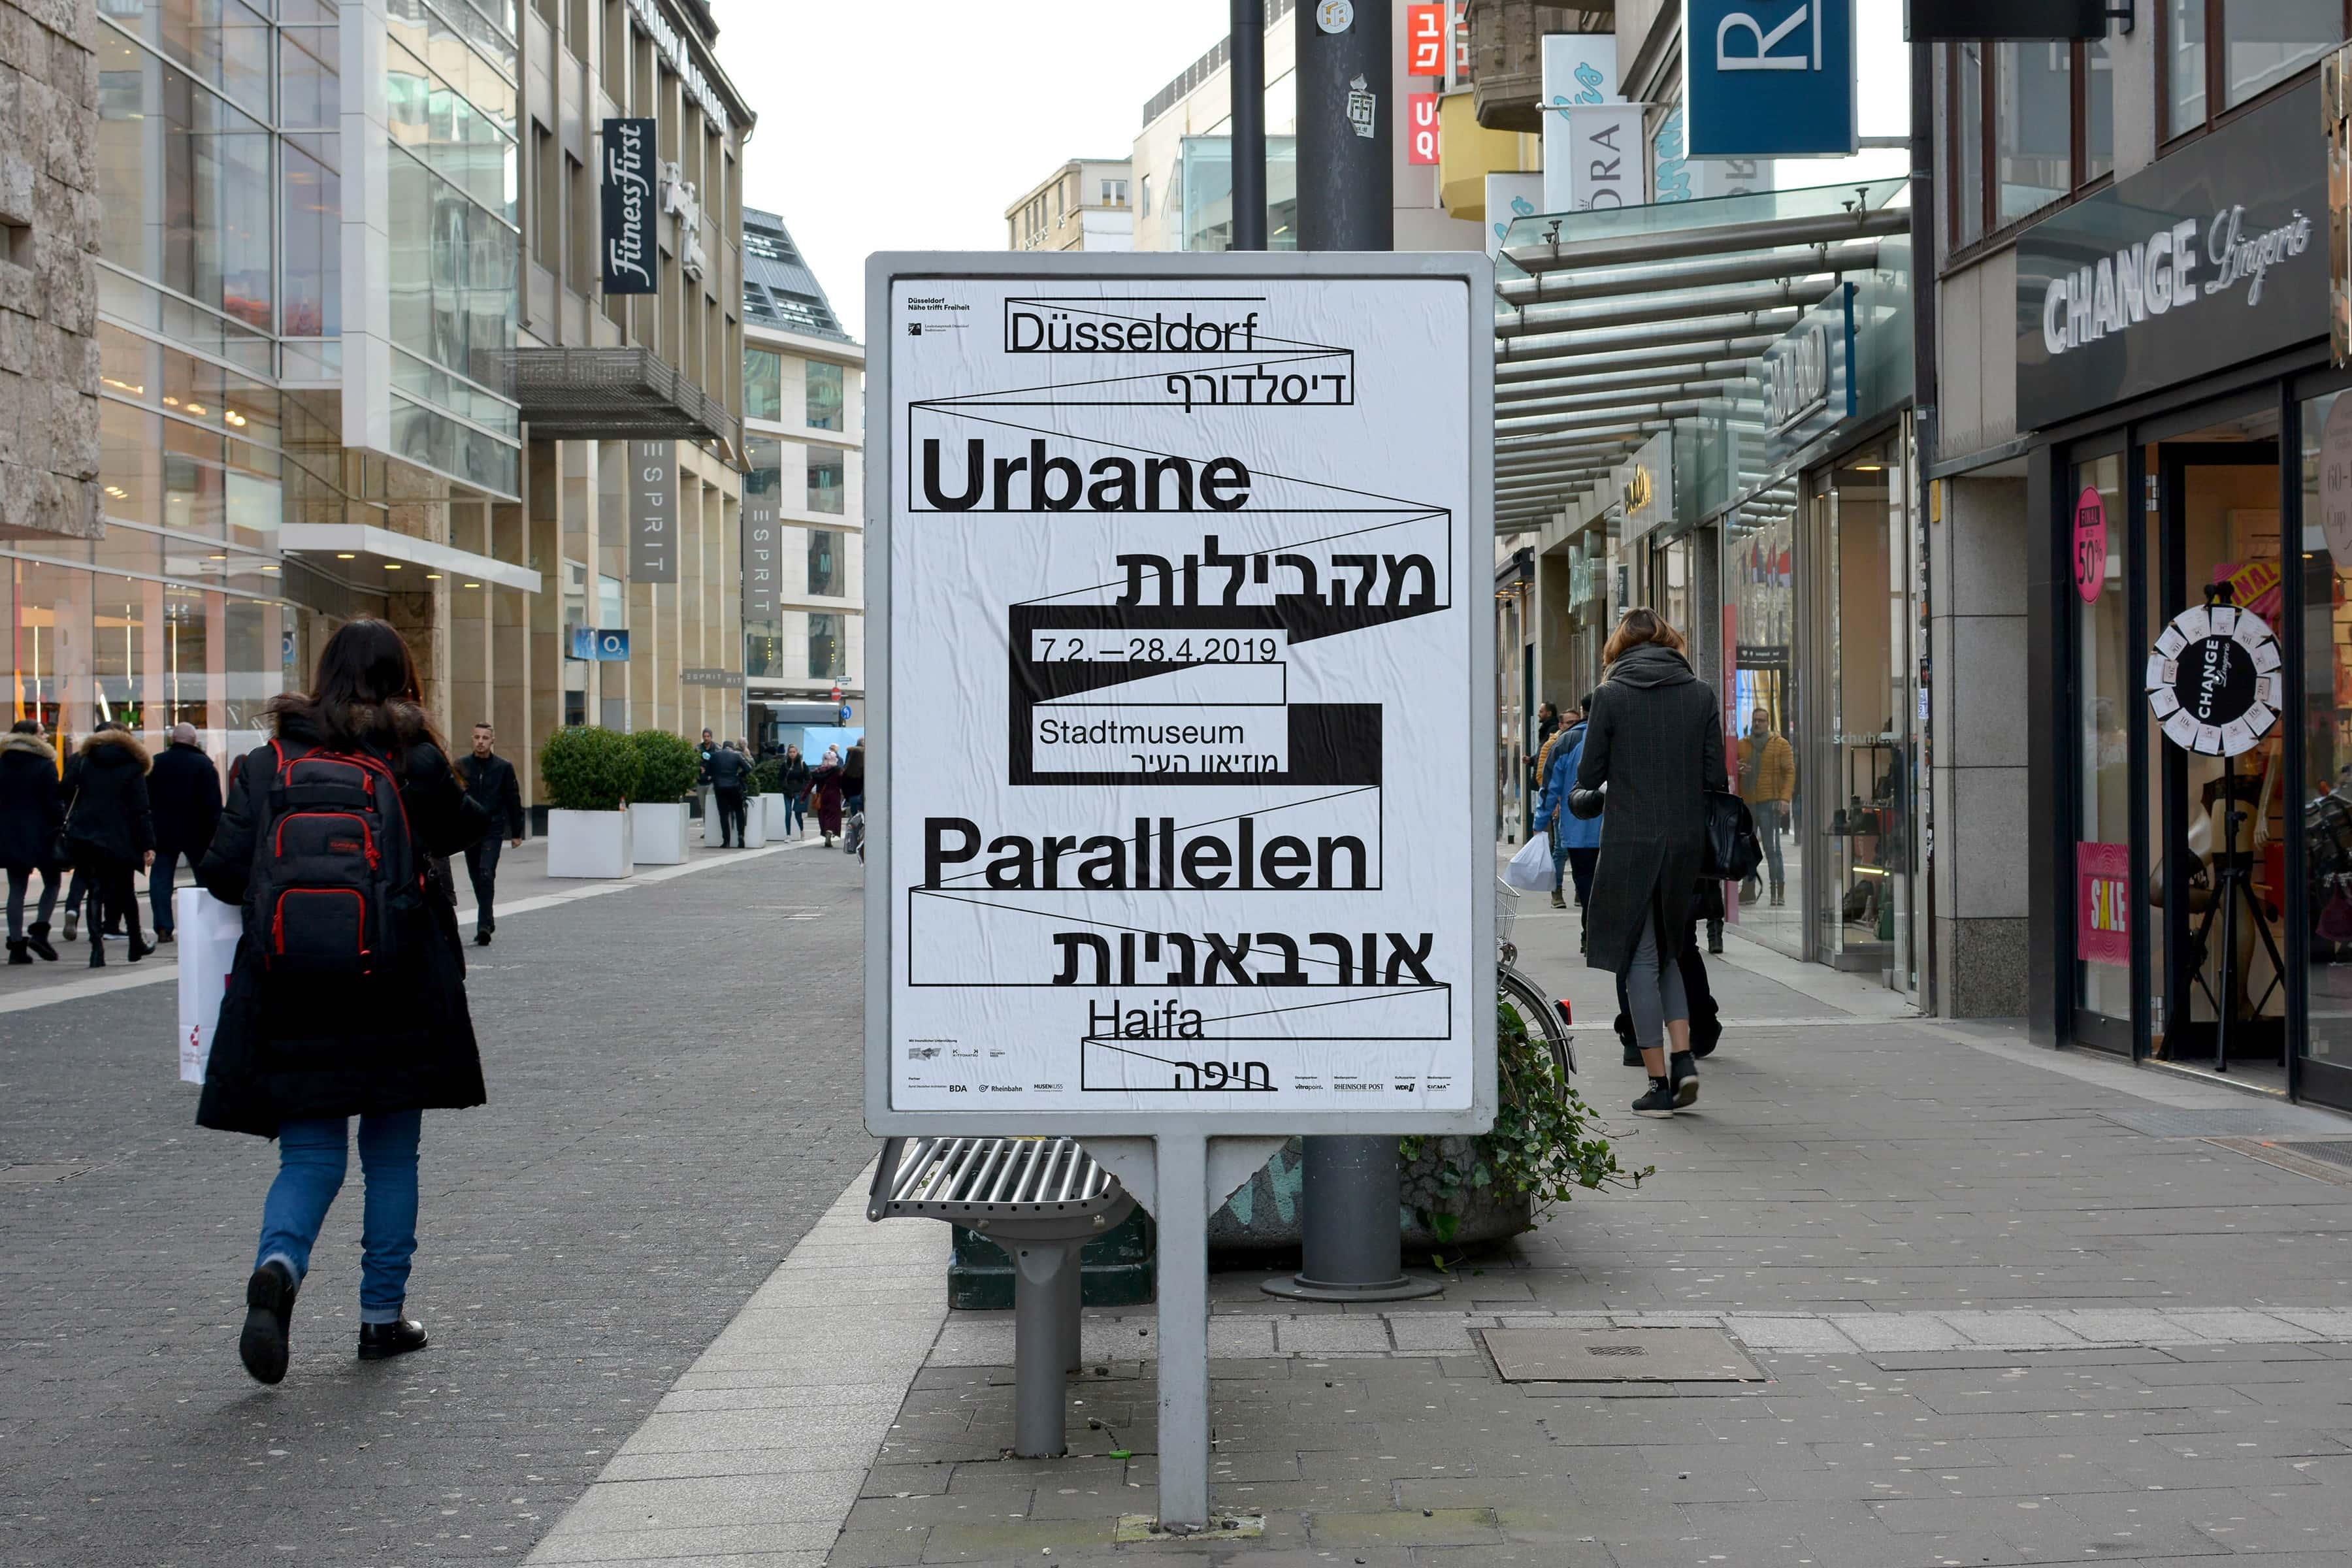 Düsseldorf, Stadtmuseum, Ausstellungsdesign, Poster, Grafik